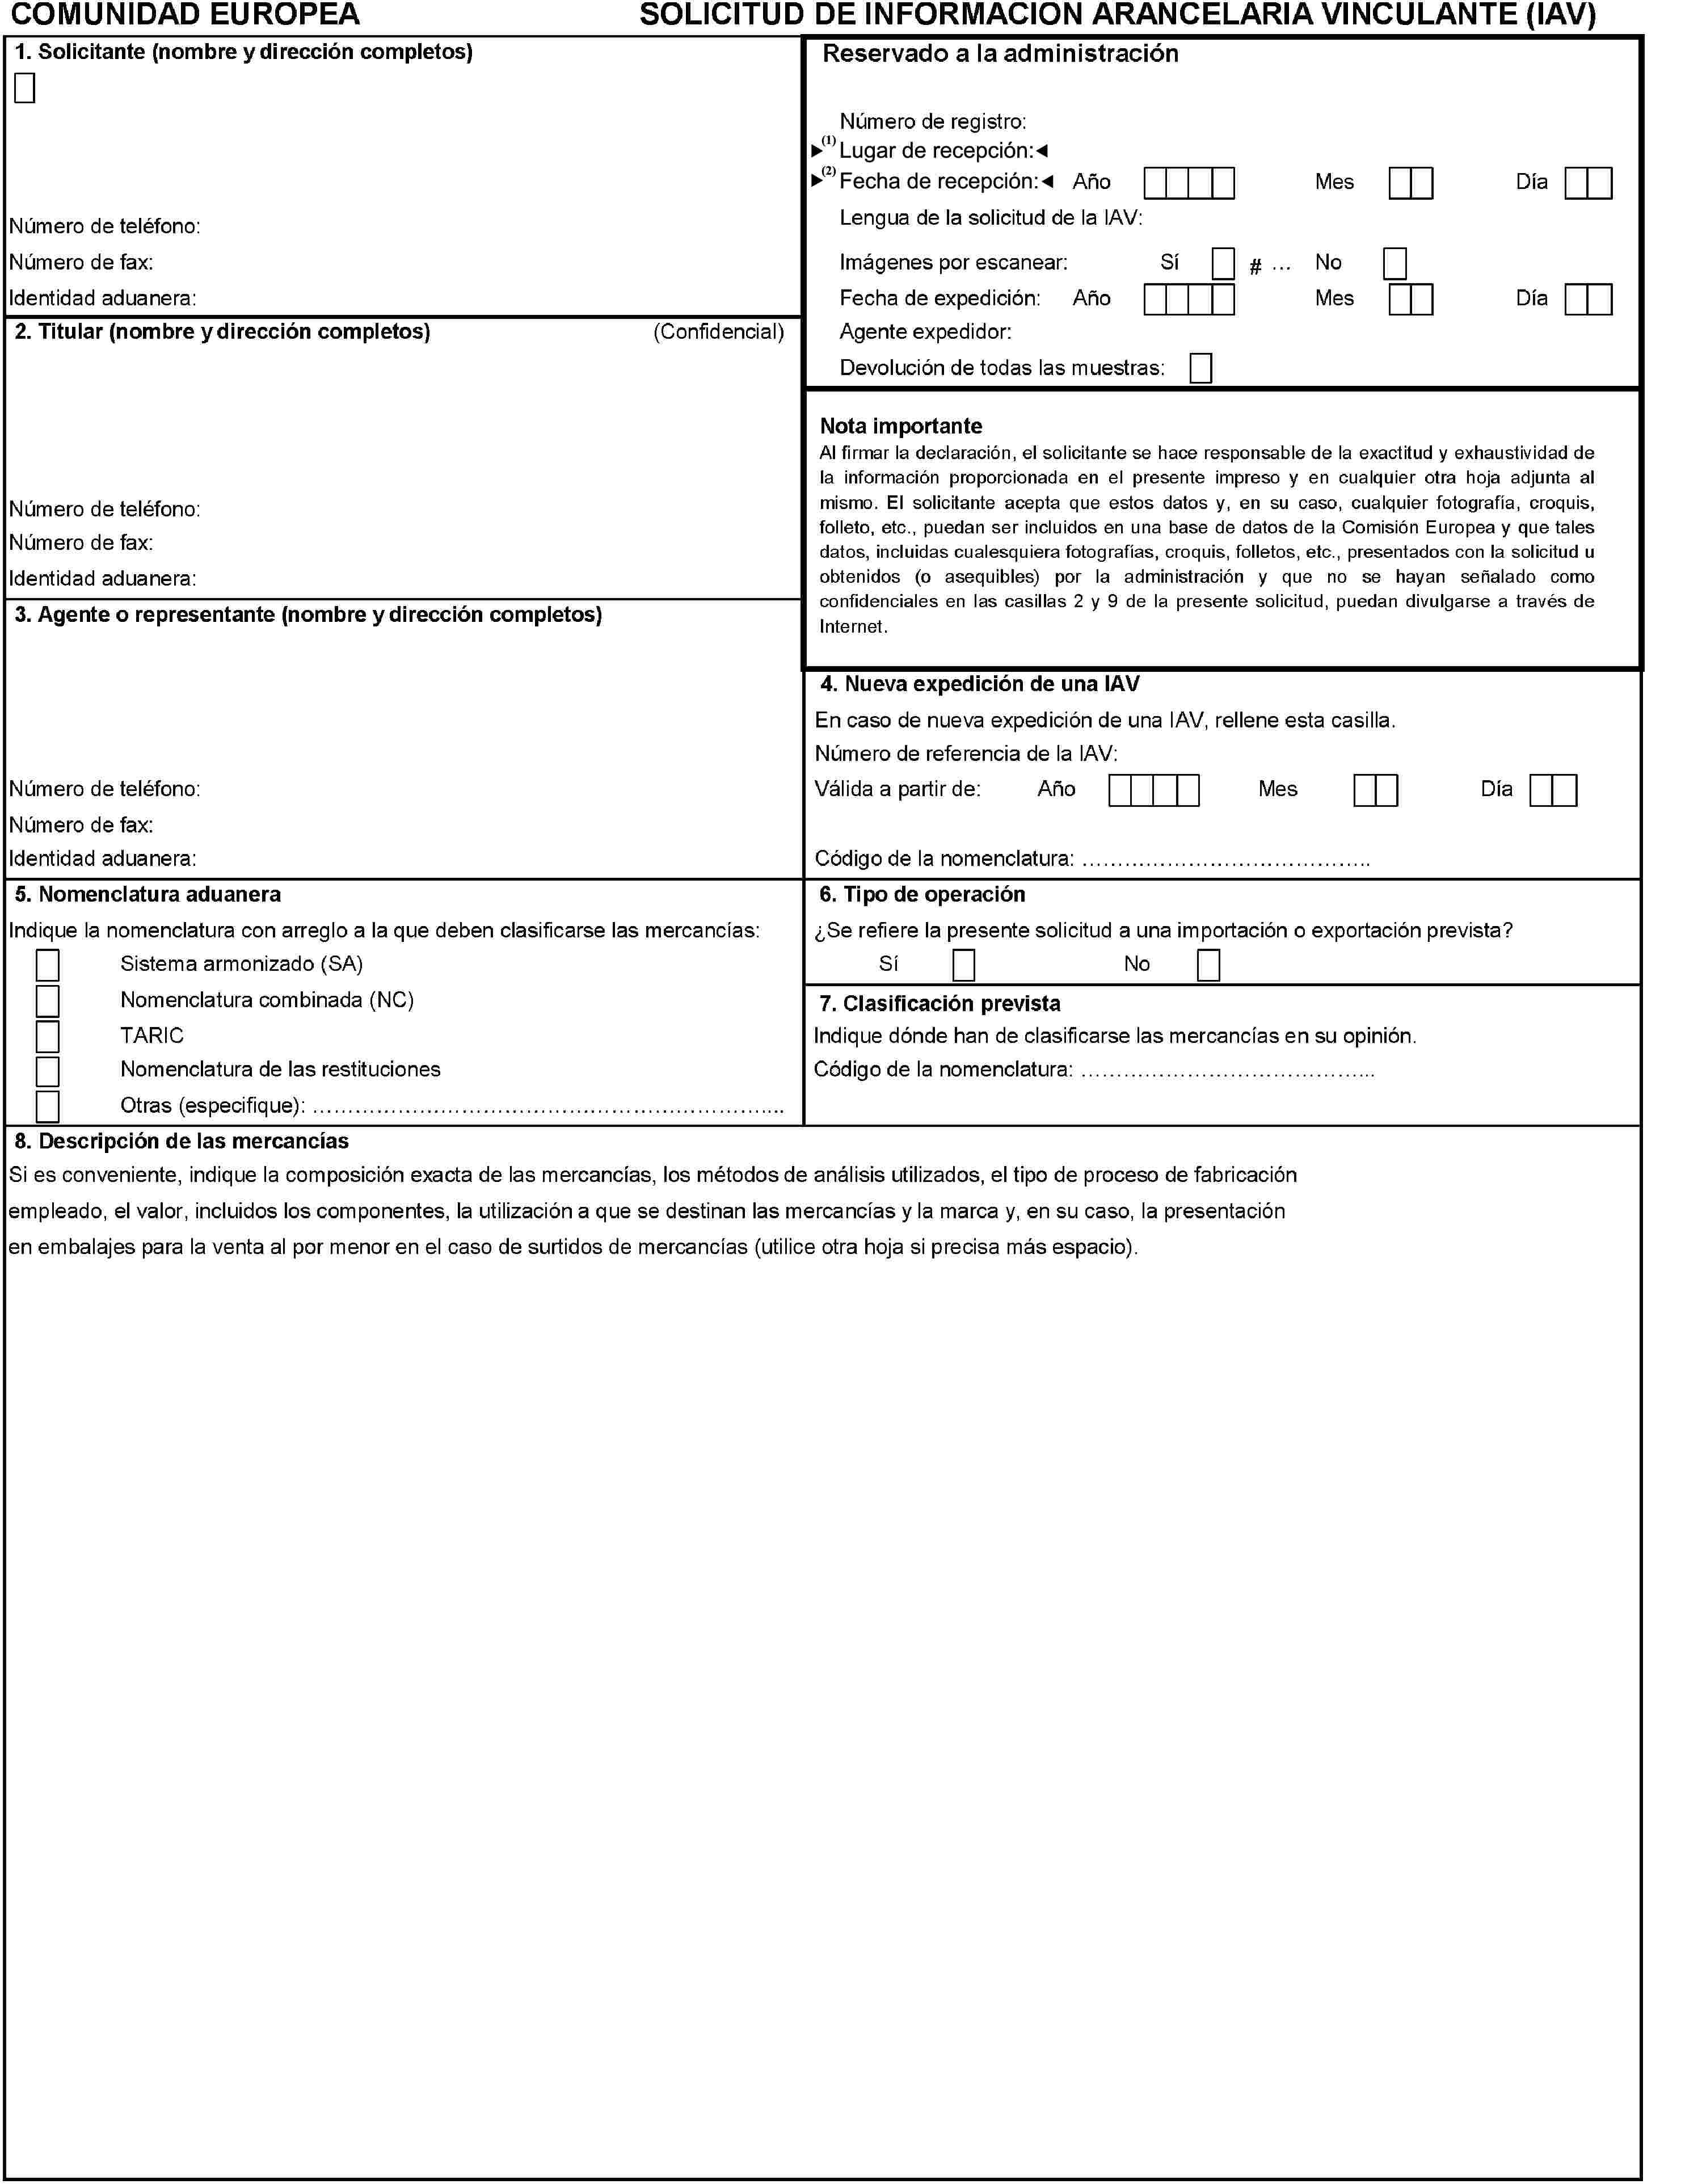 EUR-Lex - 01993R2454-20130131 - EN - EUR-Lex